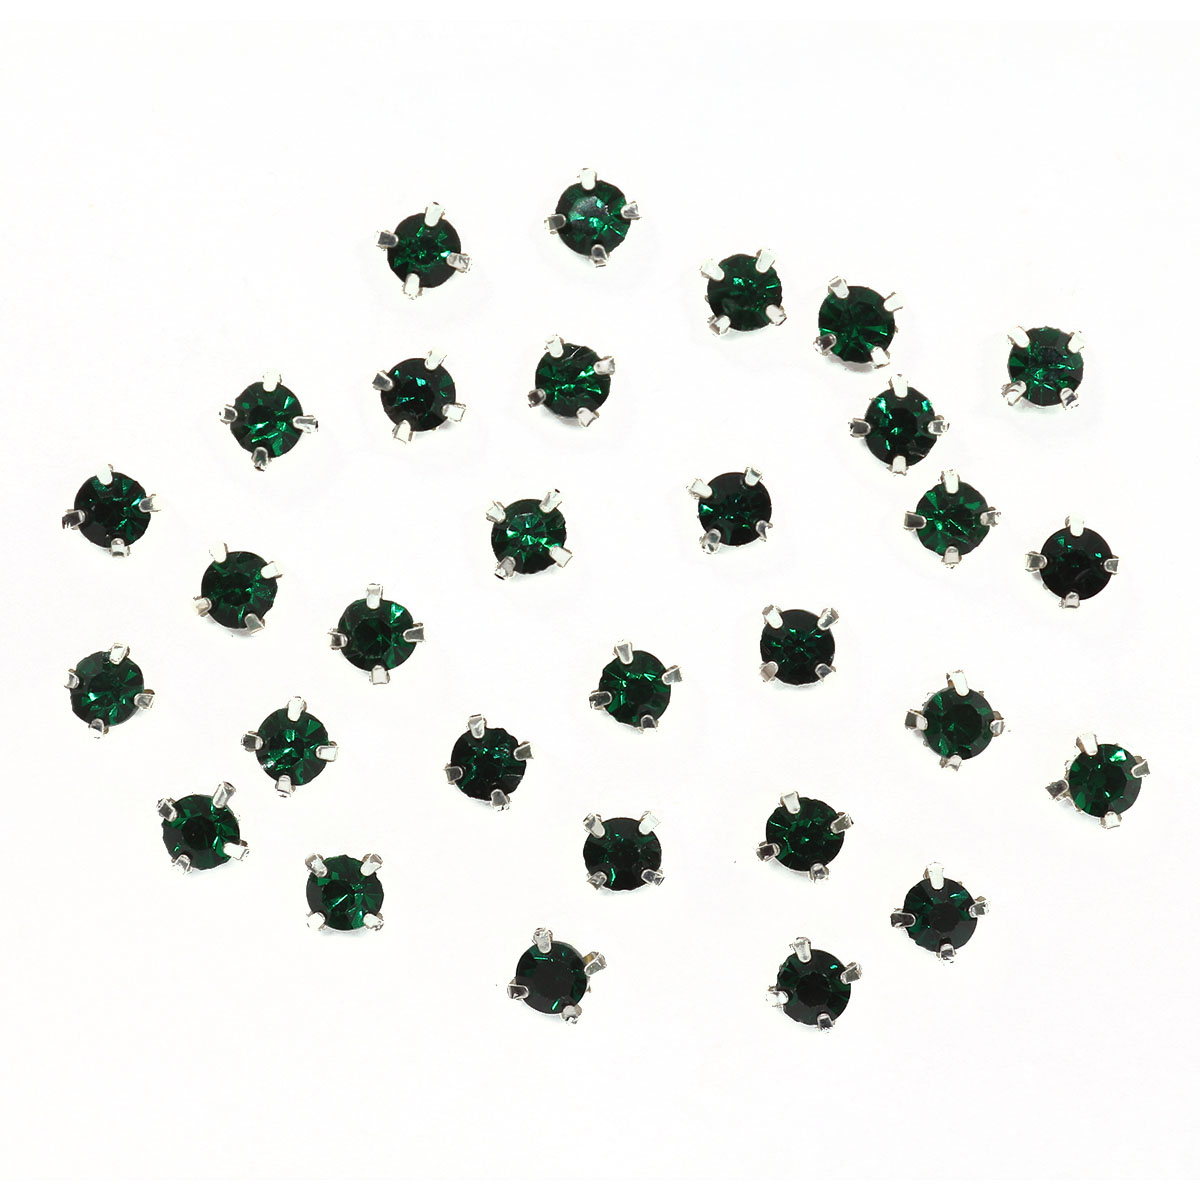 СЦ016НН44 Хрустальные стразы в цапах круглые (серебро) изумруд 4*4мм, 29-30шт/упак Астра